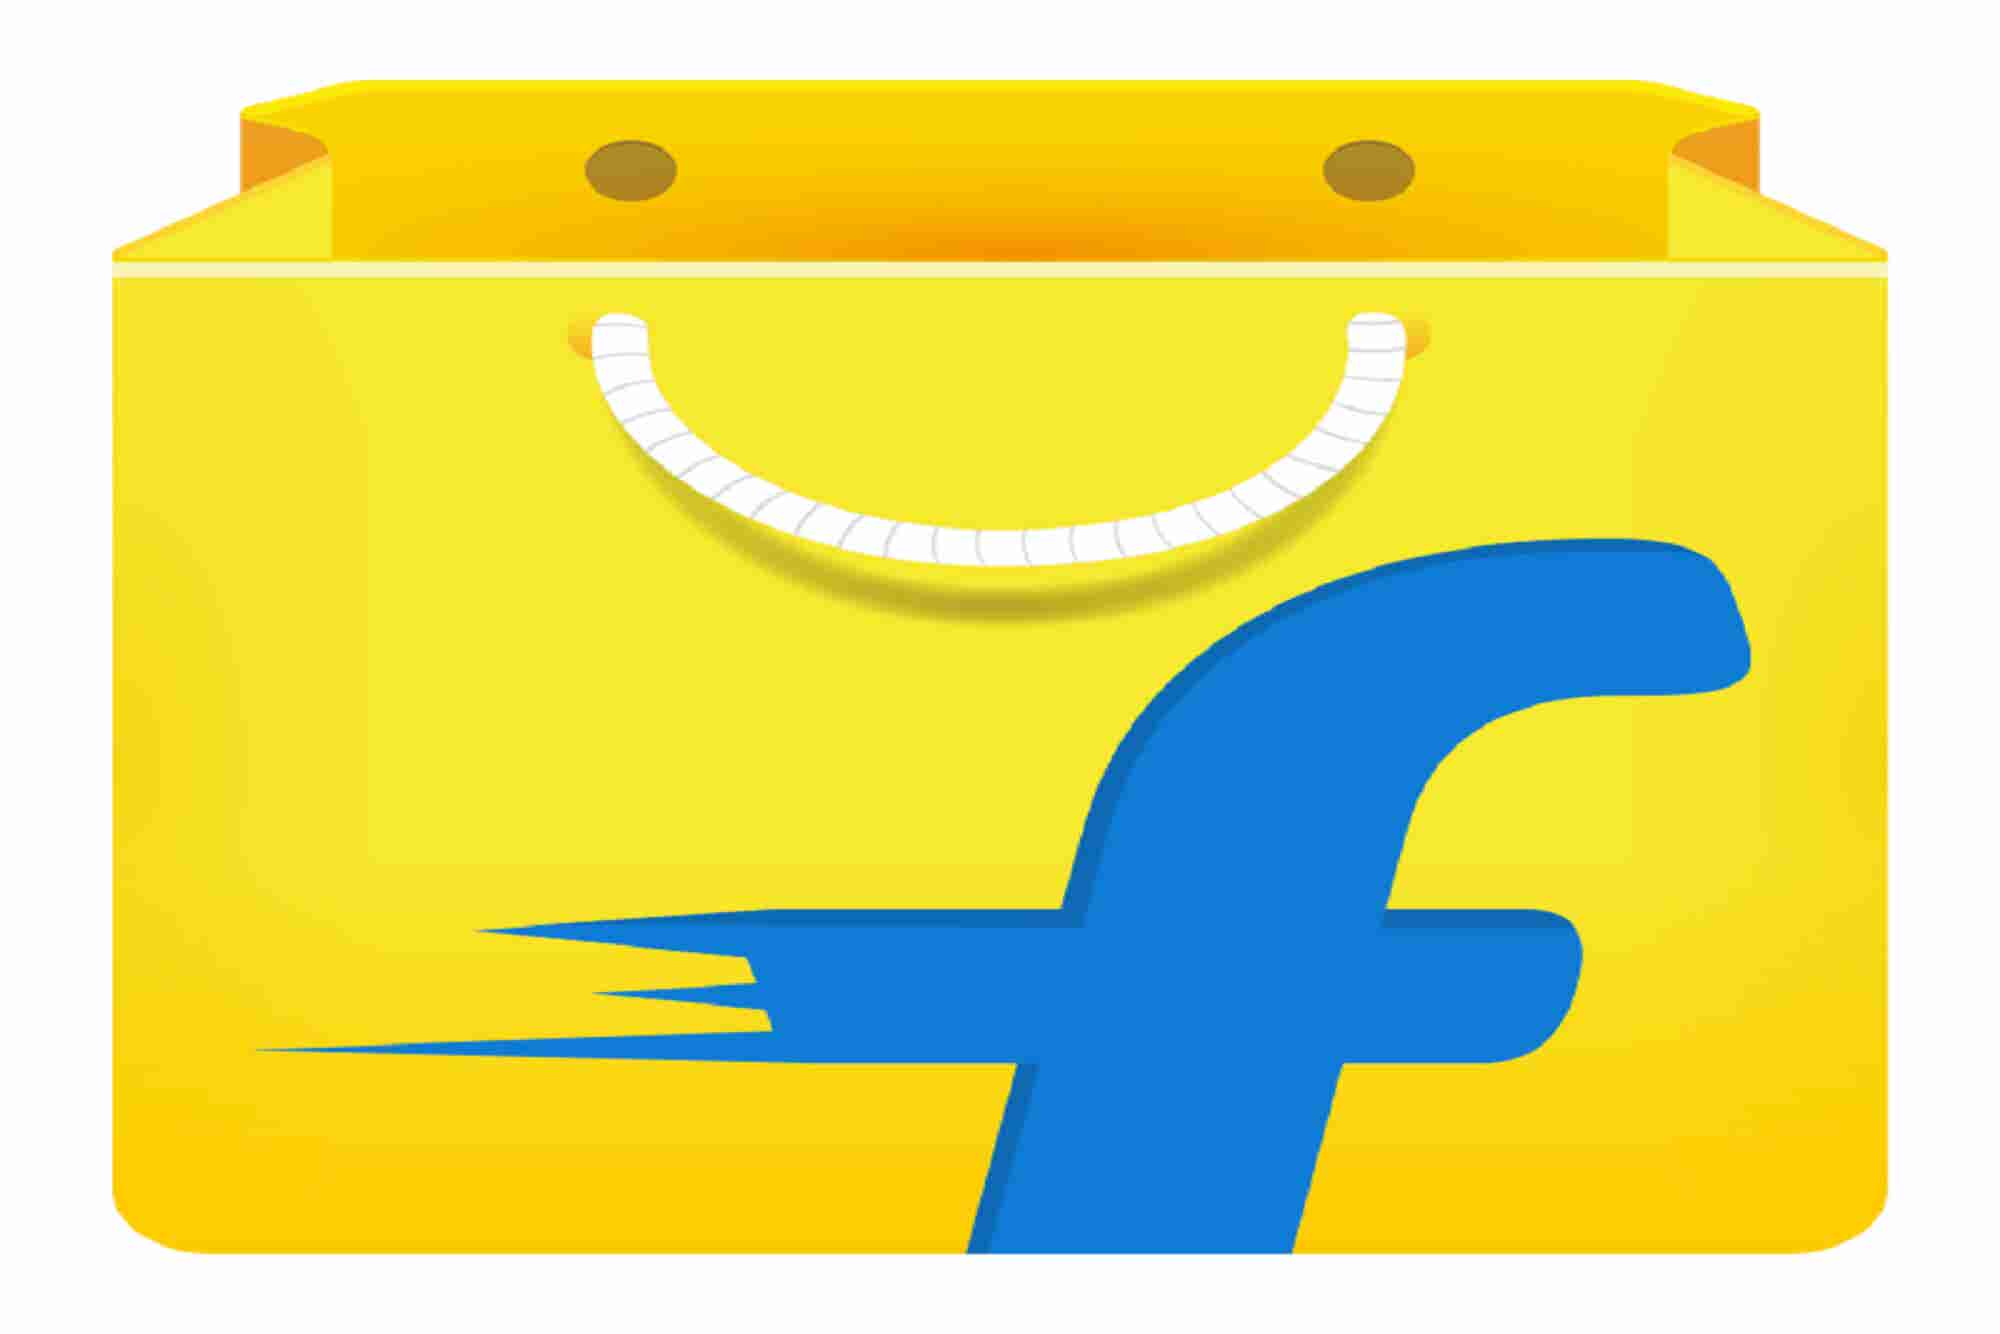 Flipkart Acquires eBay India, Raises $1.4 Billion In Funds